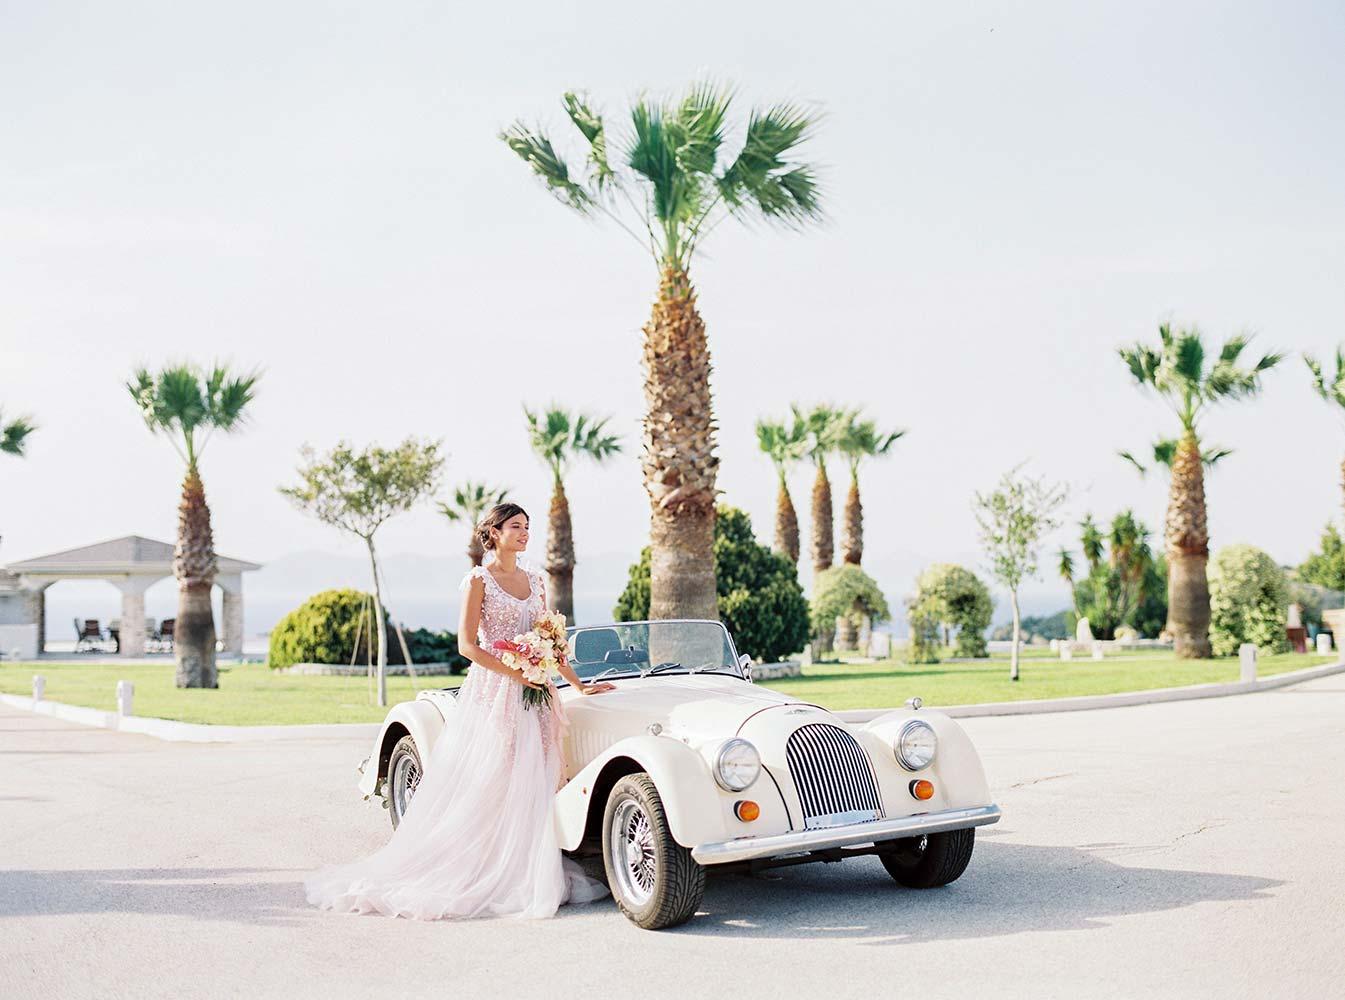 02_tomas_dolejsi_fine_art_destination_wedding_photographer